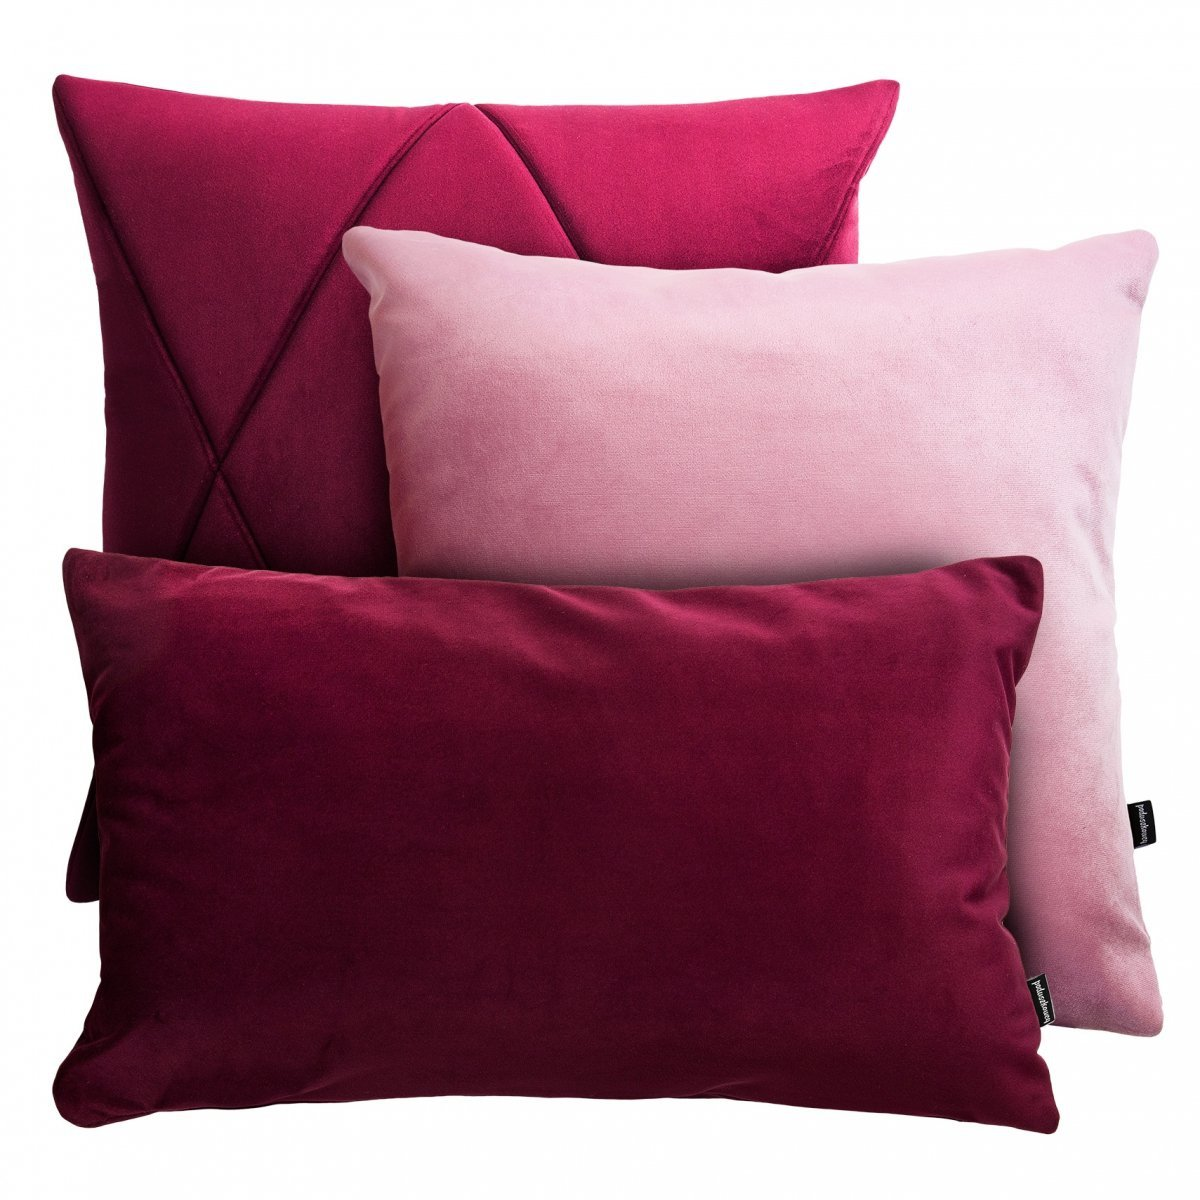 Bordowo różowy zestaw poduszek Velvet+Touch